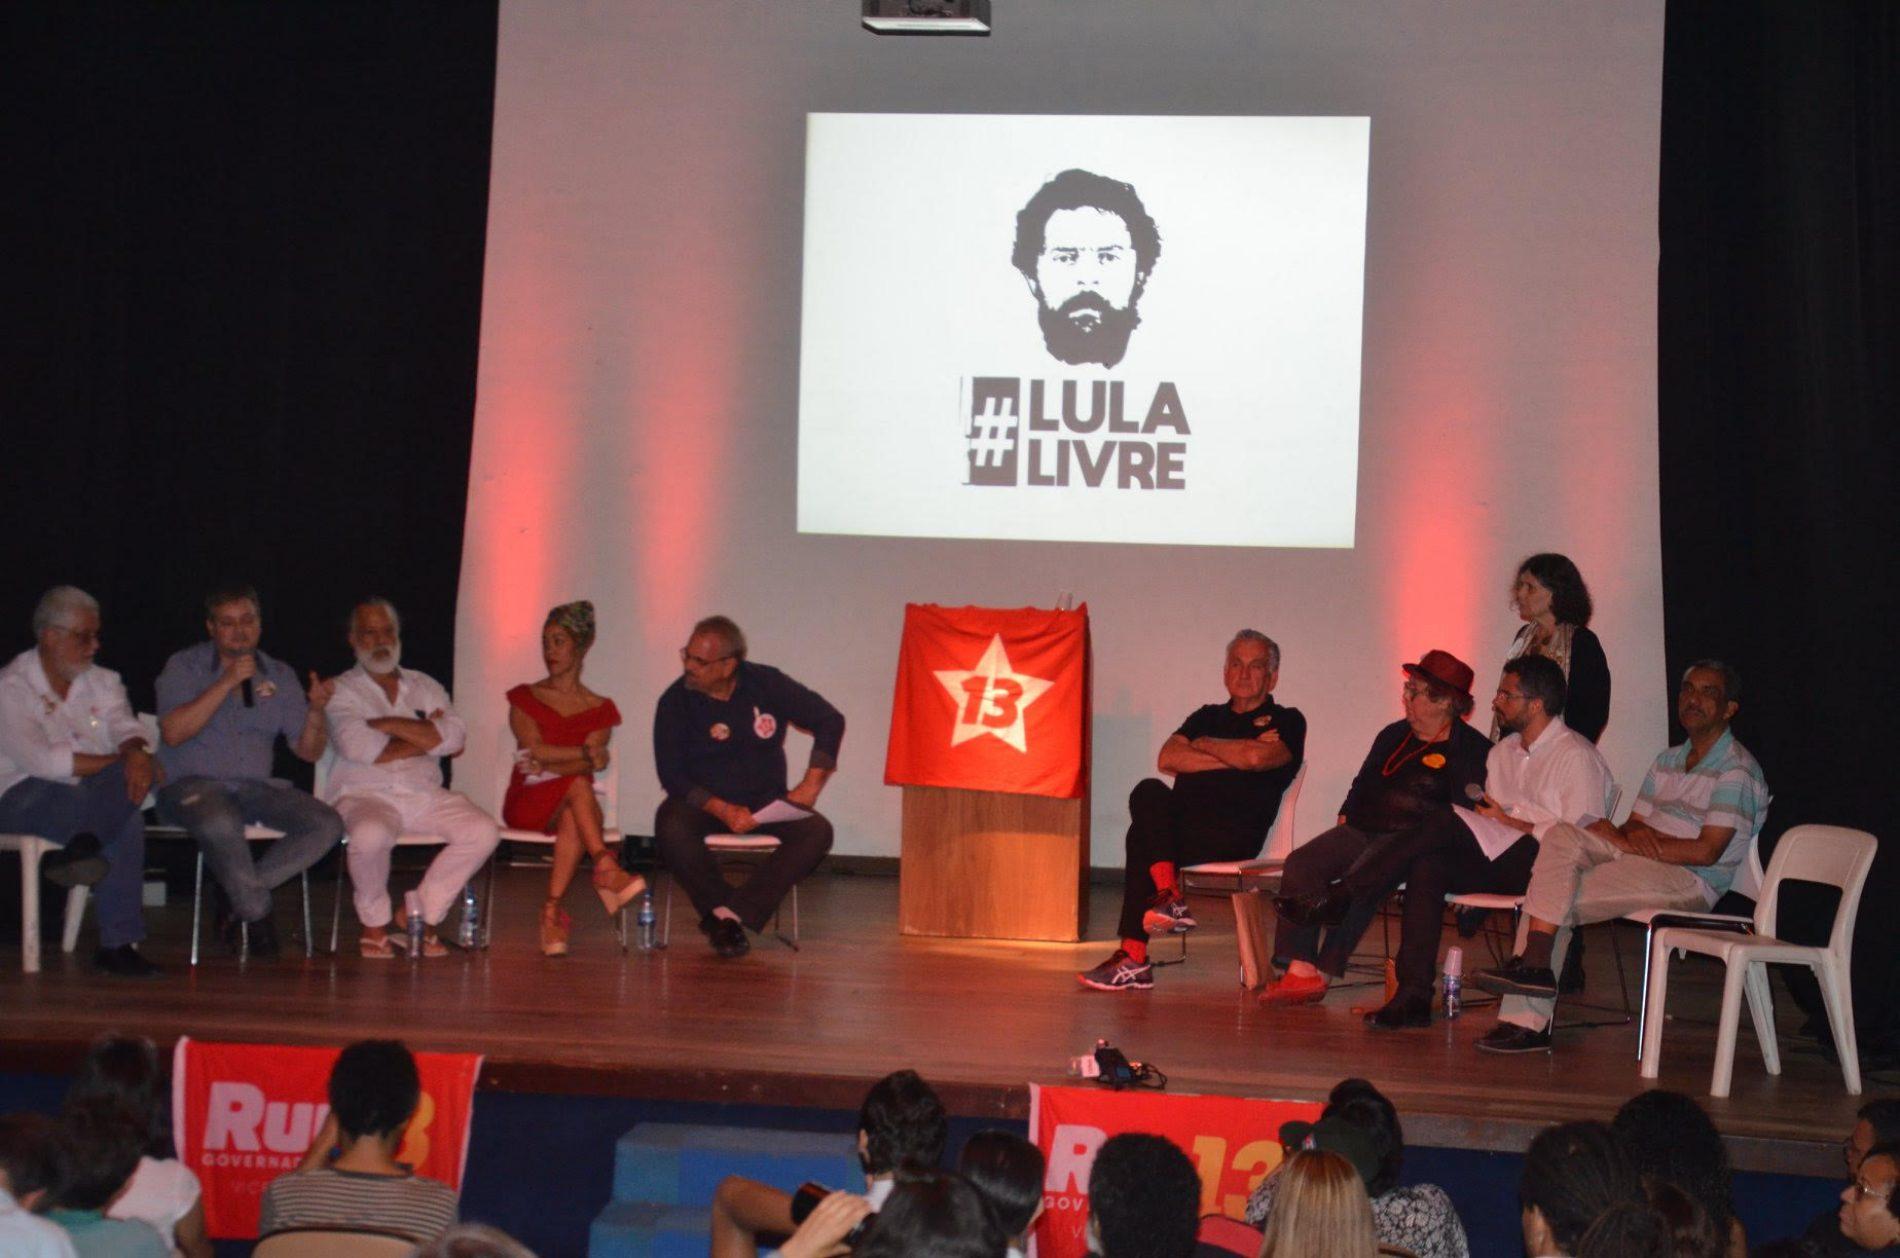 Mateus Aleluia, Juca Ferreira, Manno Góes e personalidades da Cultura declaram apoio a Galo